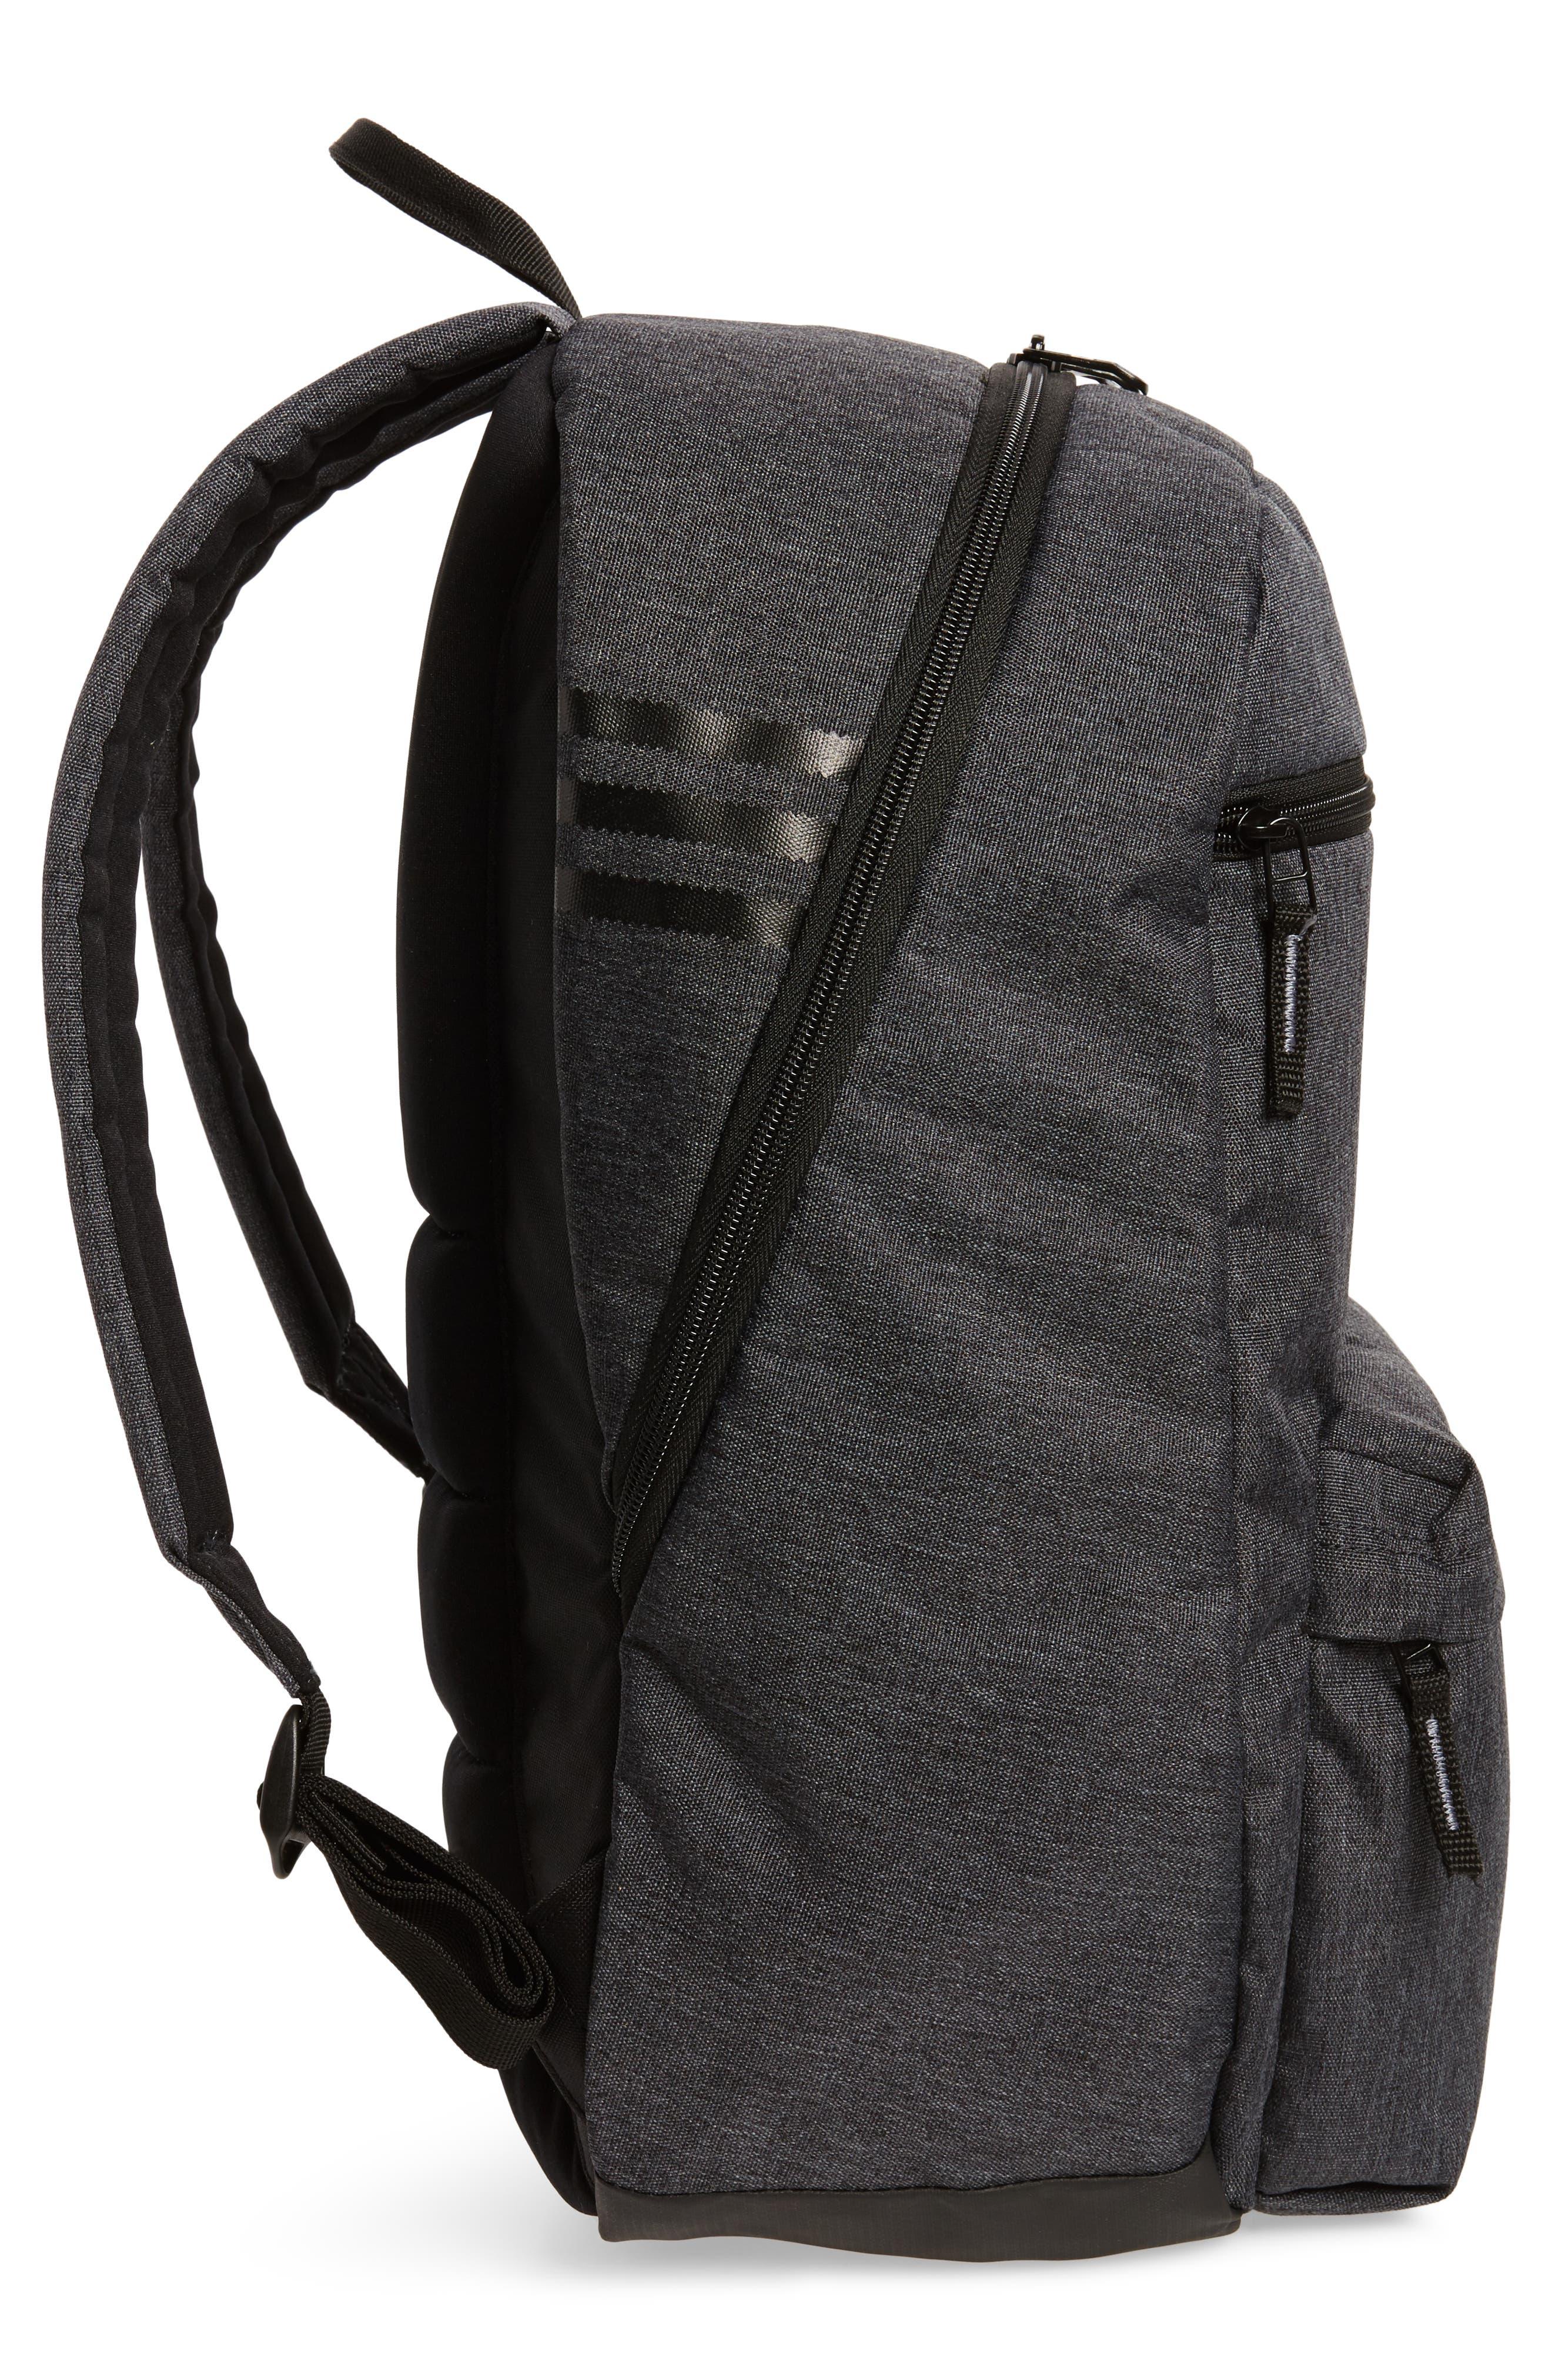 National Plus Backpack,                             Alternate thumbnail 5, color,                             BLACK/ GREY HEATHER/ WHITE